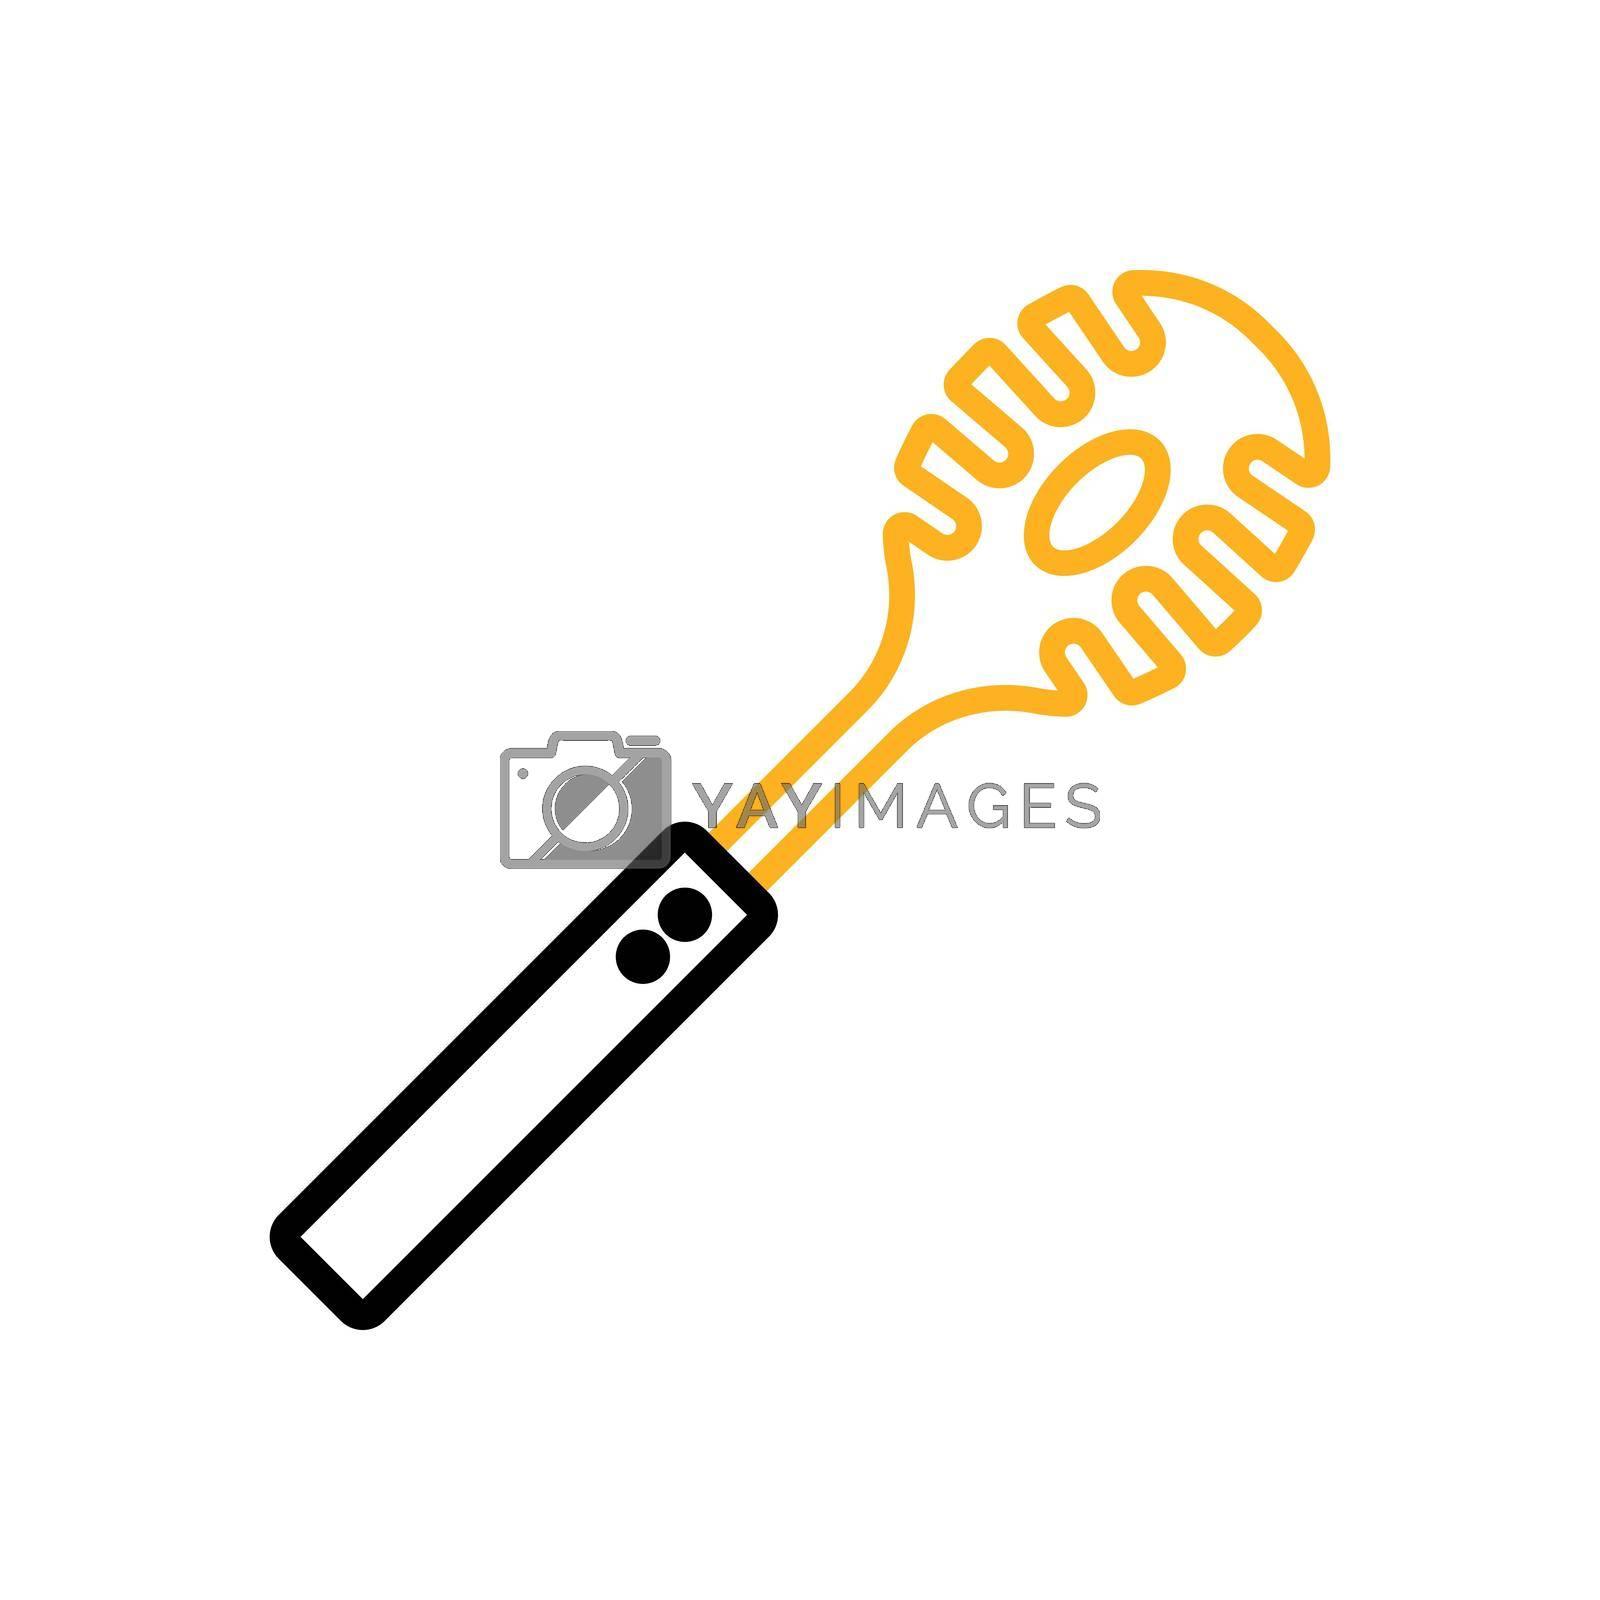 Royalty free image of Kitchenware spaghetti spoon vector icon. Kitchen appliances by nosik